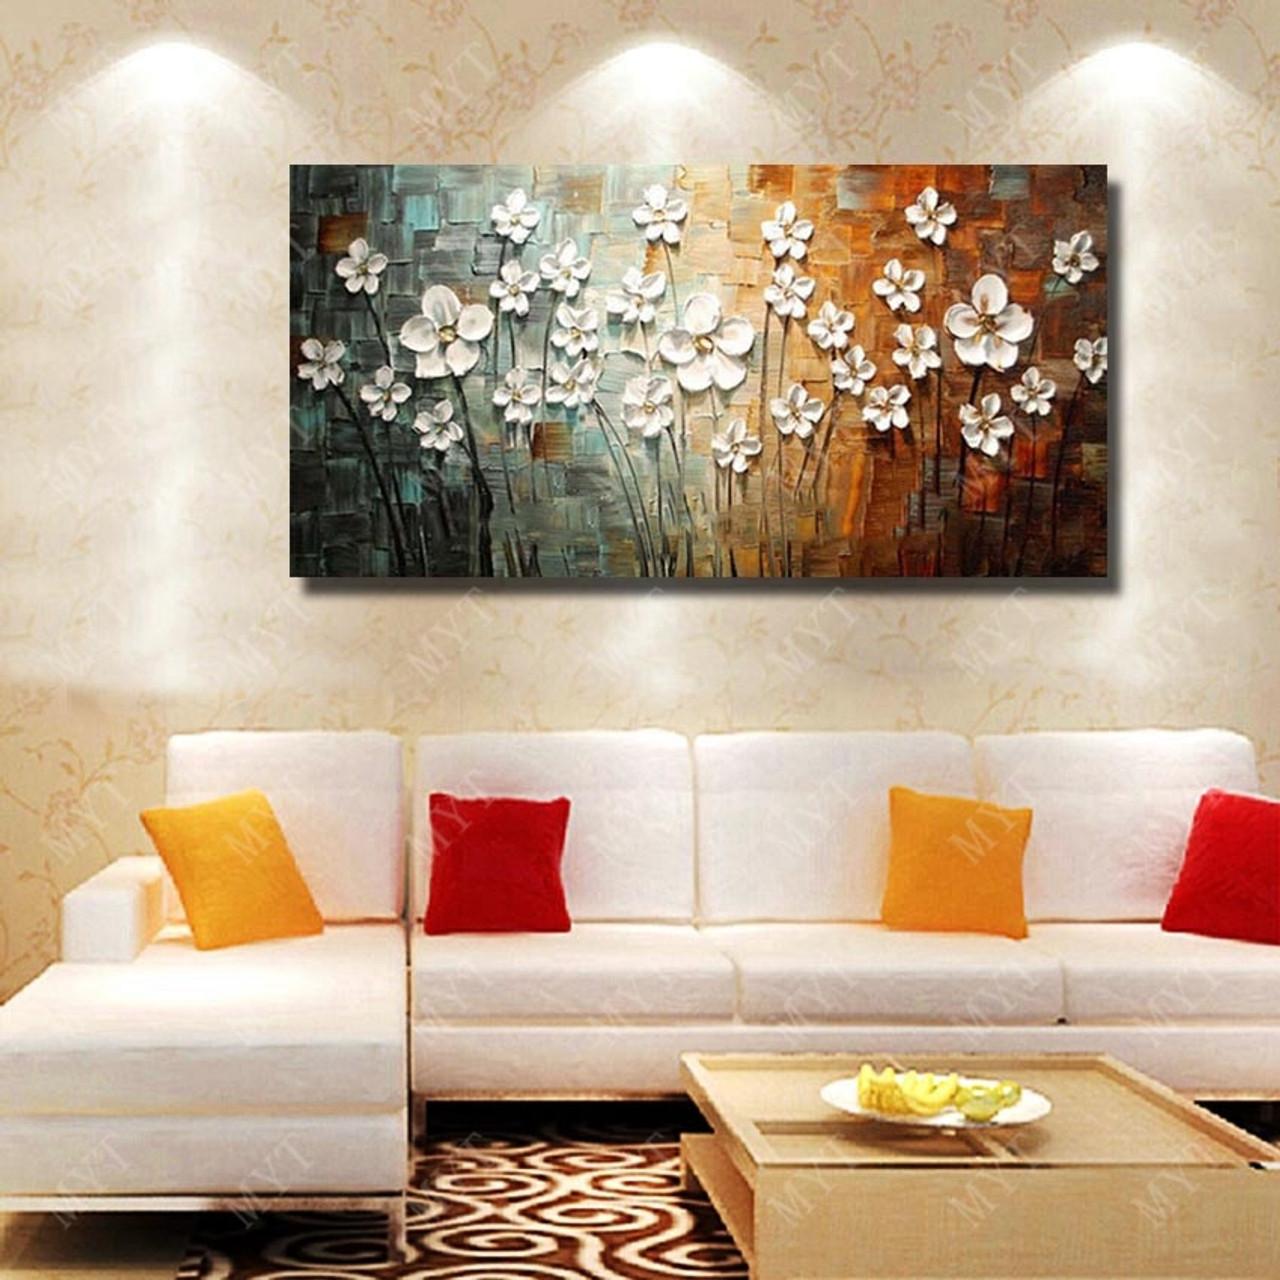 Chinese Wall Art Modern Living Room Wall Decor Flower ...